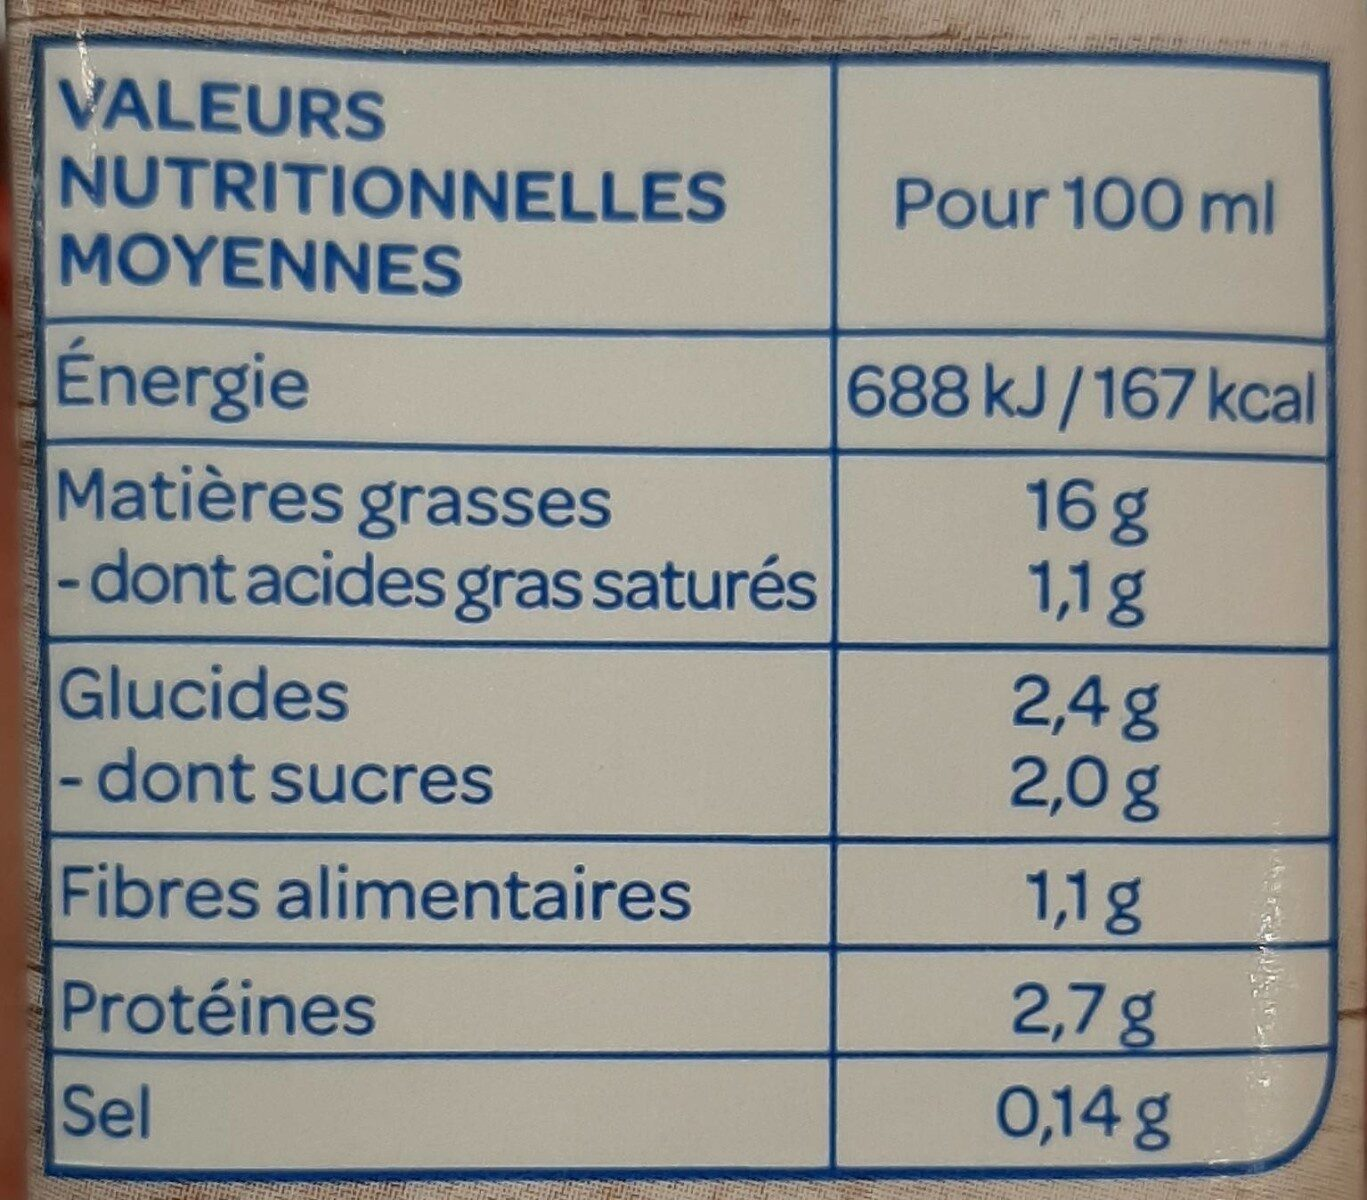 Soja Cuisine fluide - Nutrition facts - fr